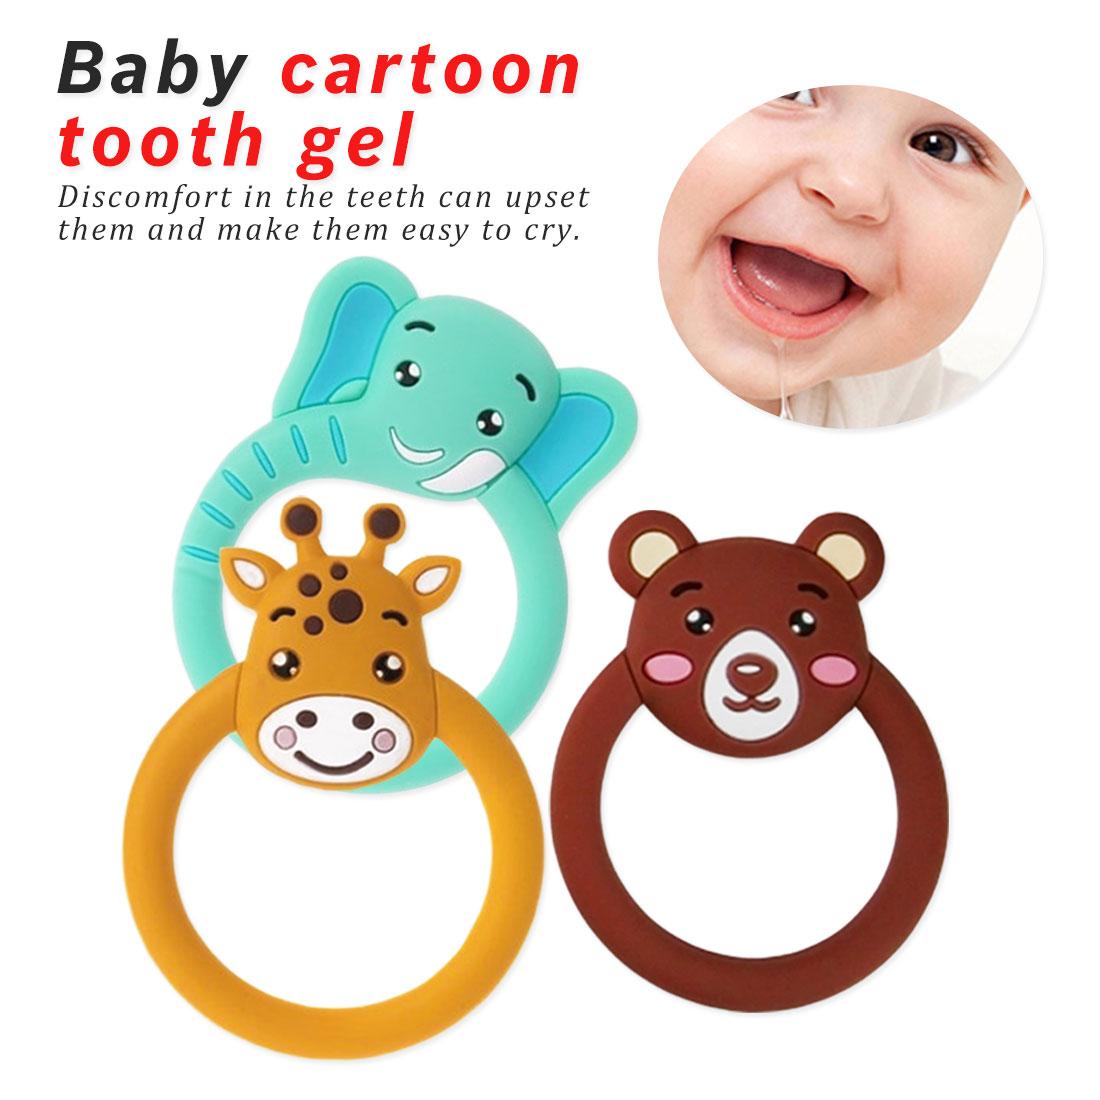 Giraffe Elephant Baby Silicone Teether Pacifier Cartoon Teething Nursing Silicone BPA Free Necklace Toys